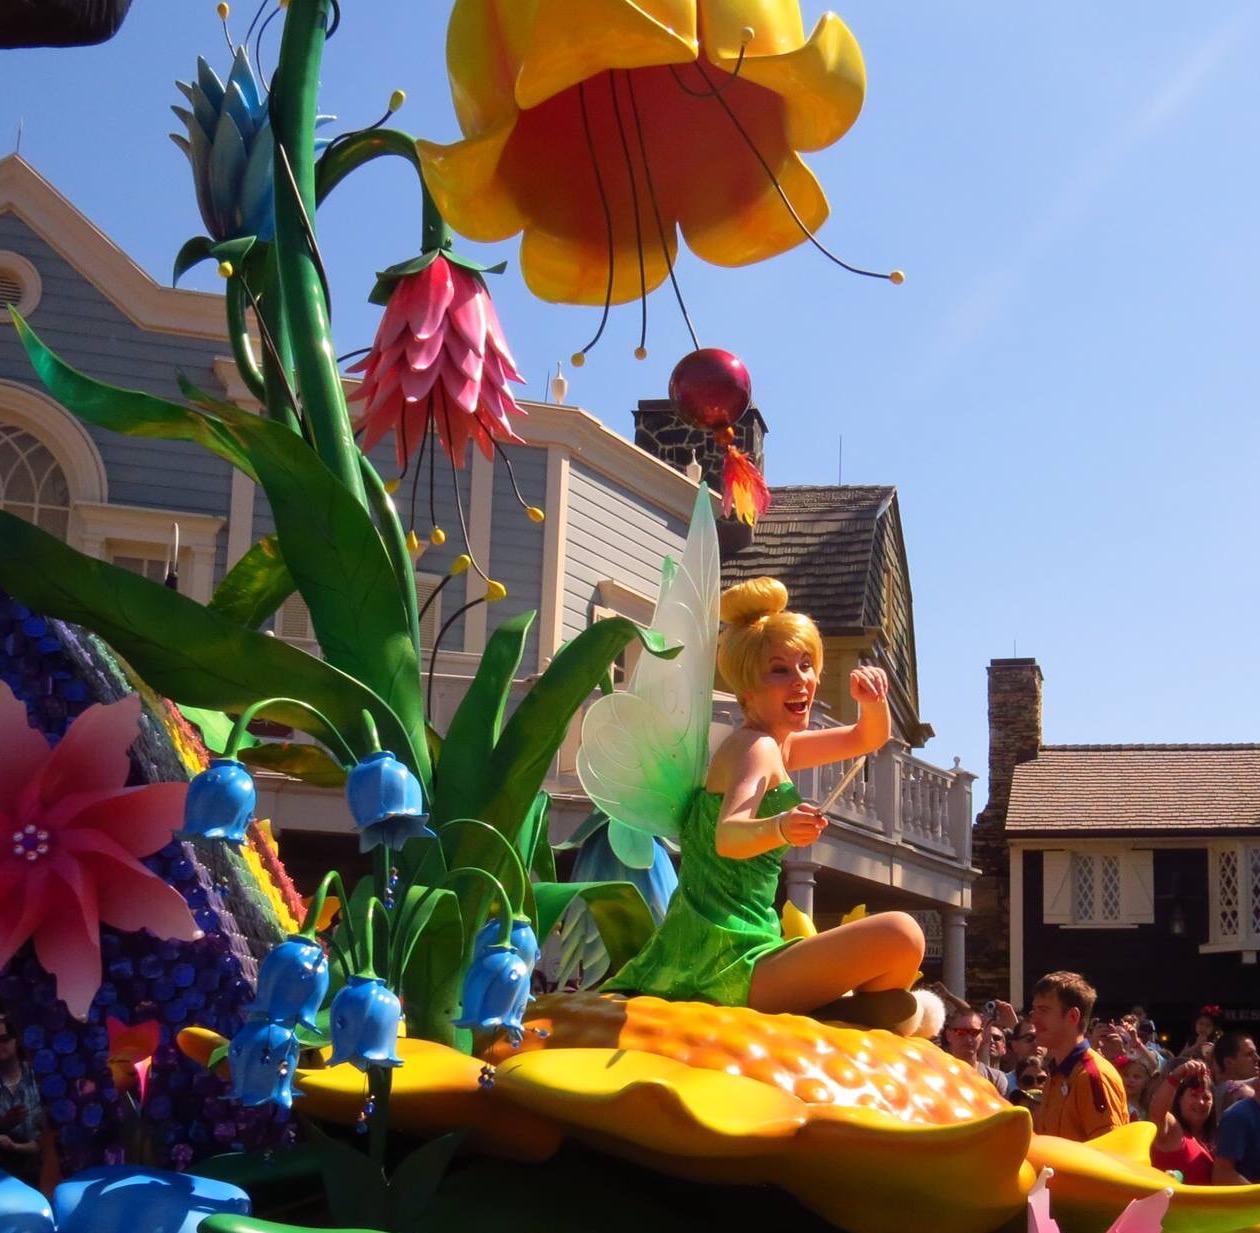 Seeing Tinkerbell at Disney World